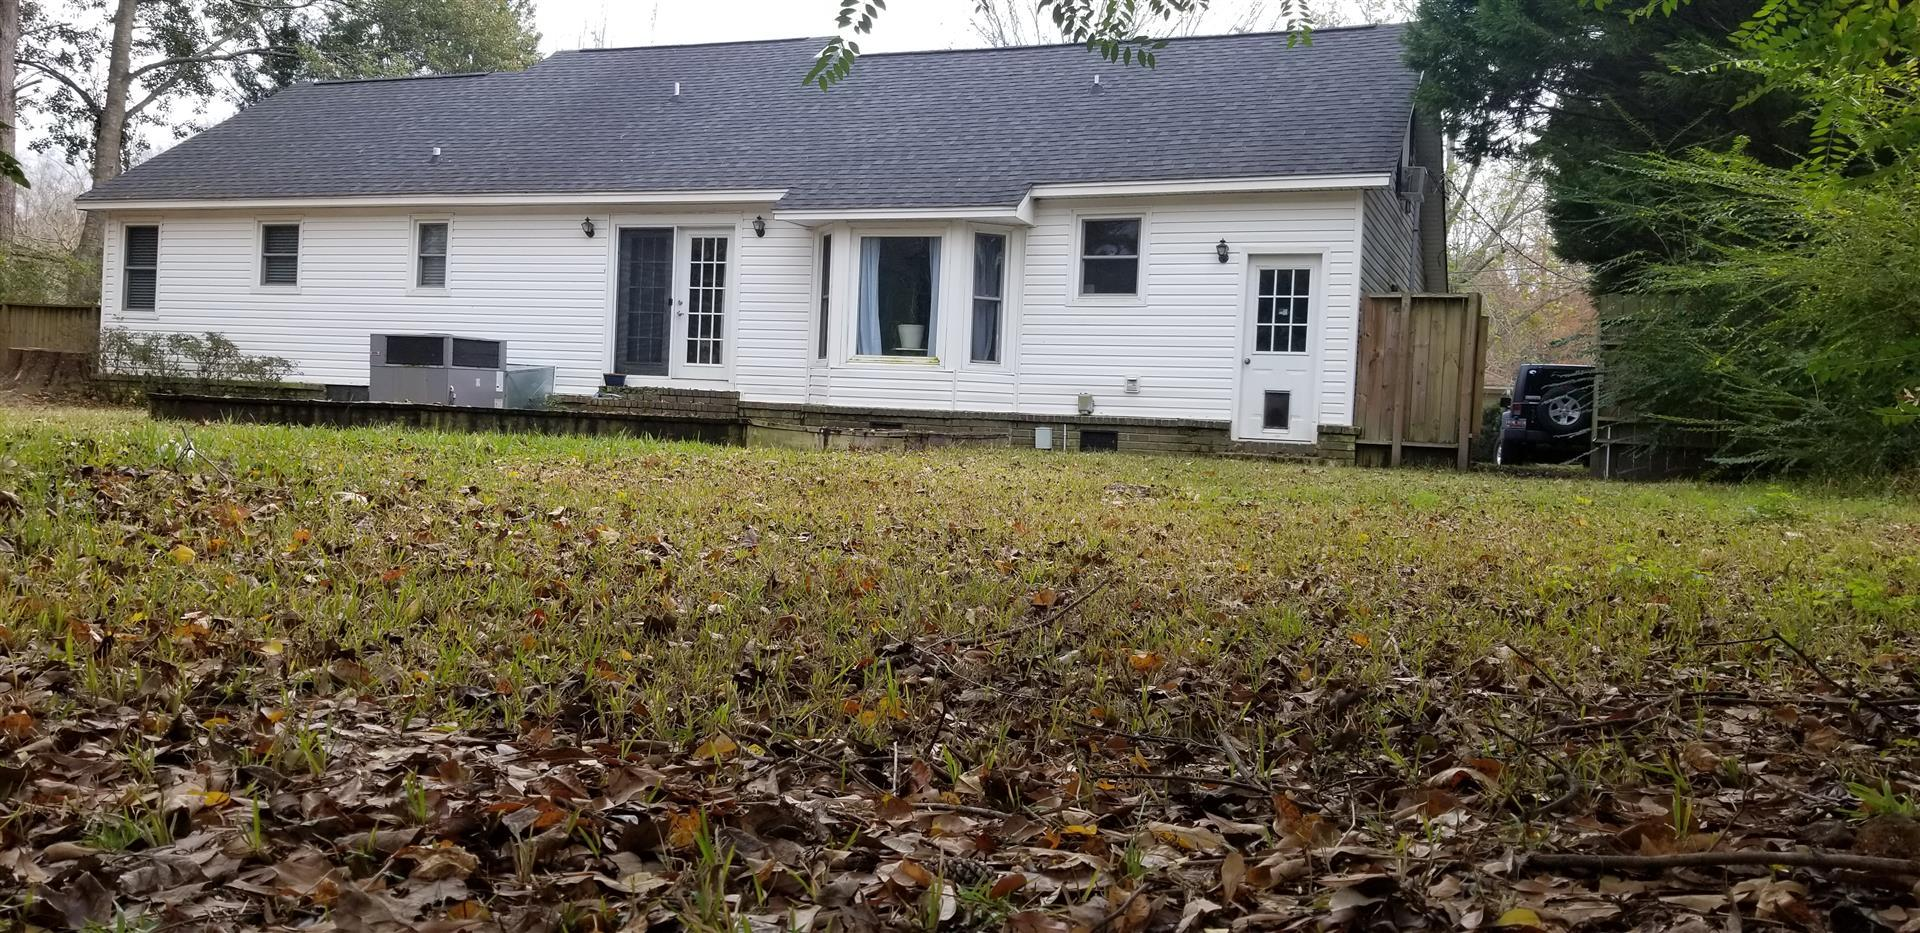 Lynwood Homes For Sale - 1093 Kingswood, Charleston, SC - 0